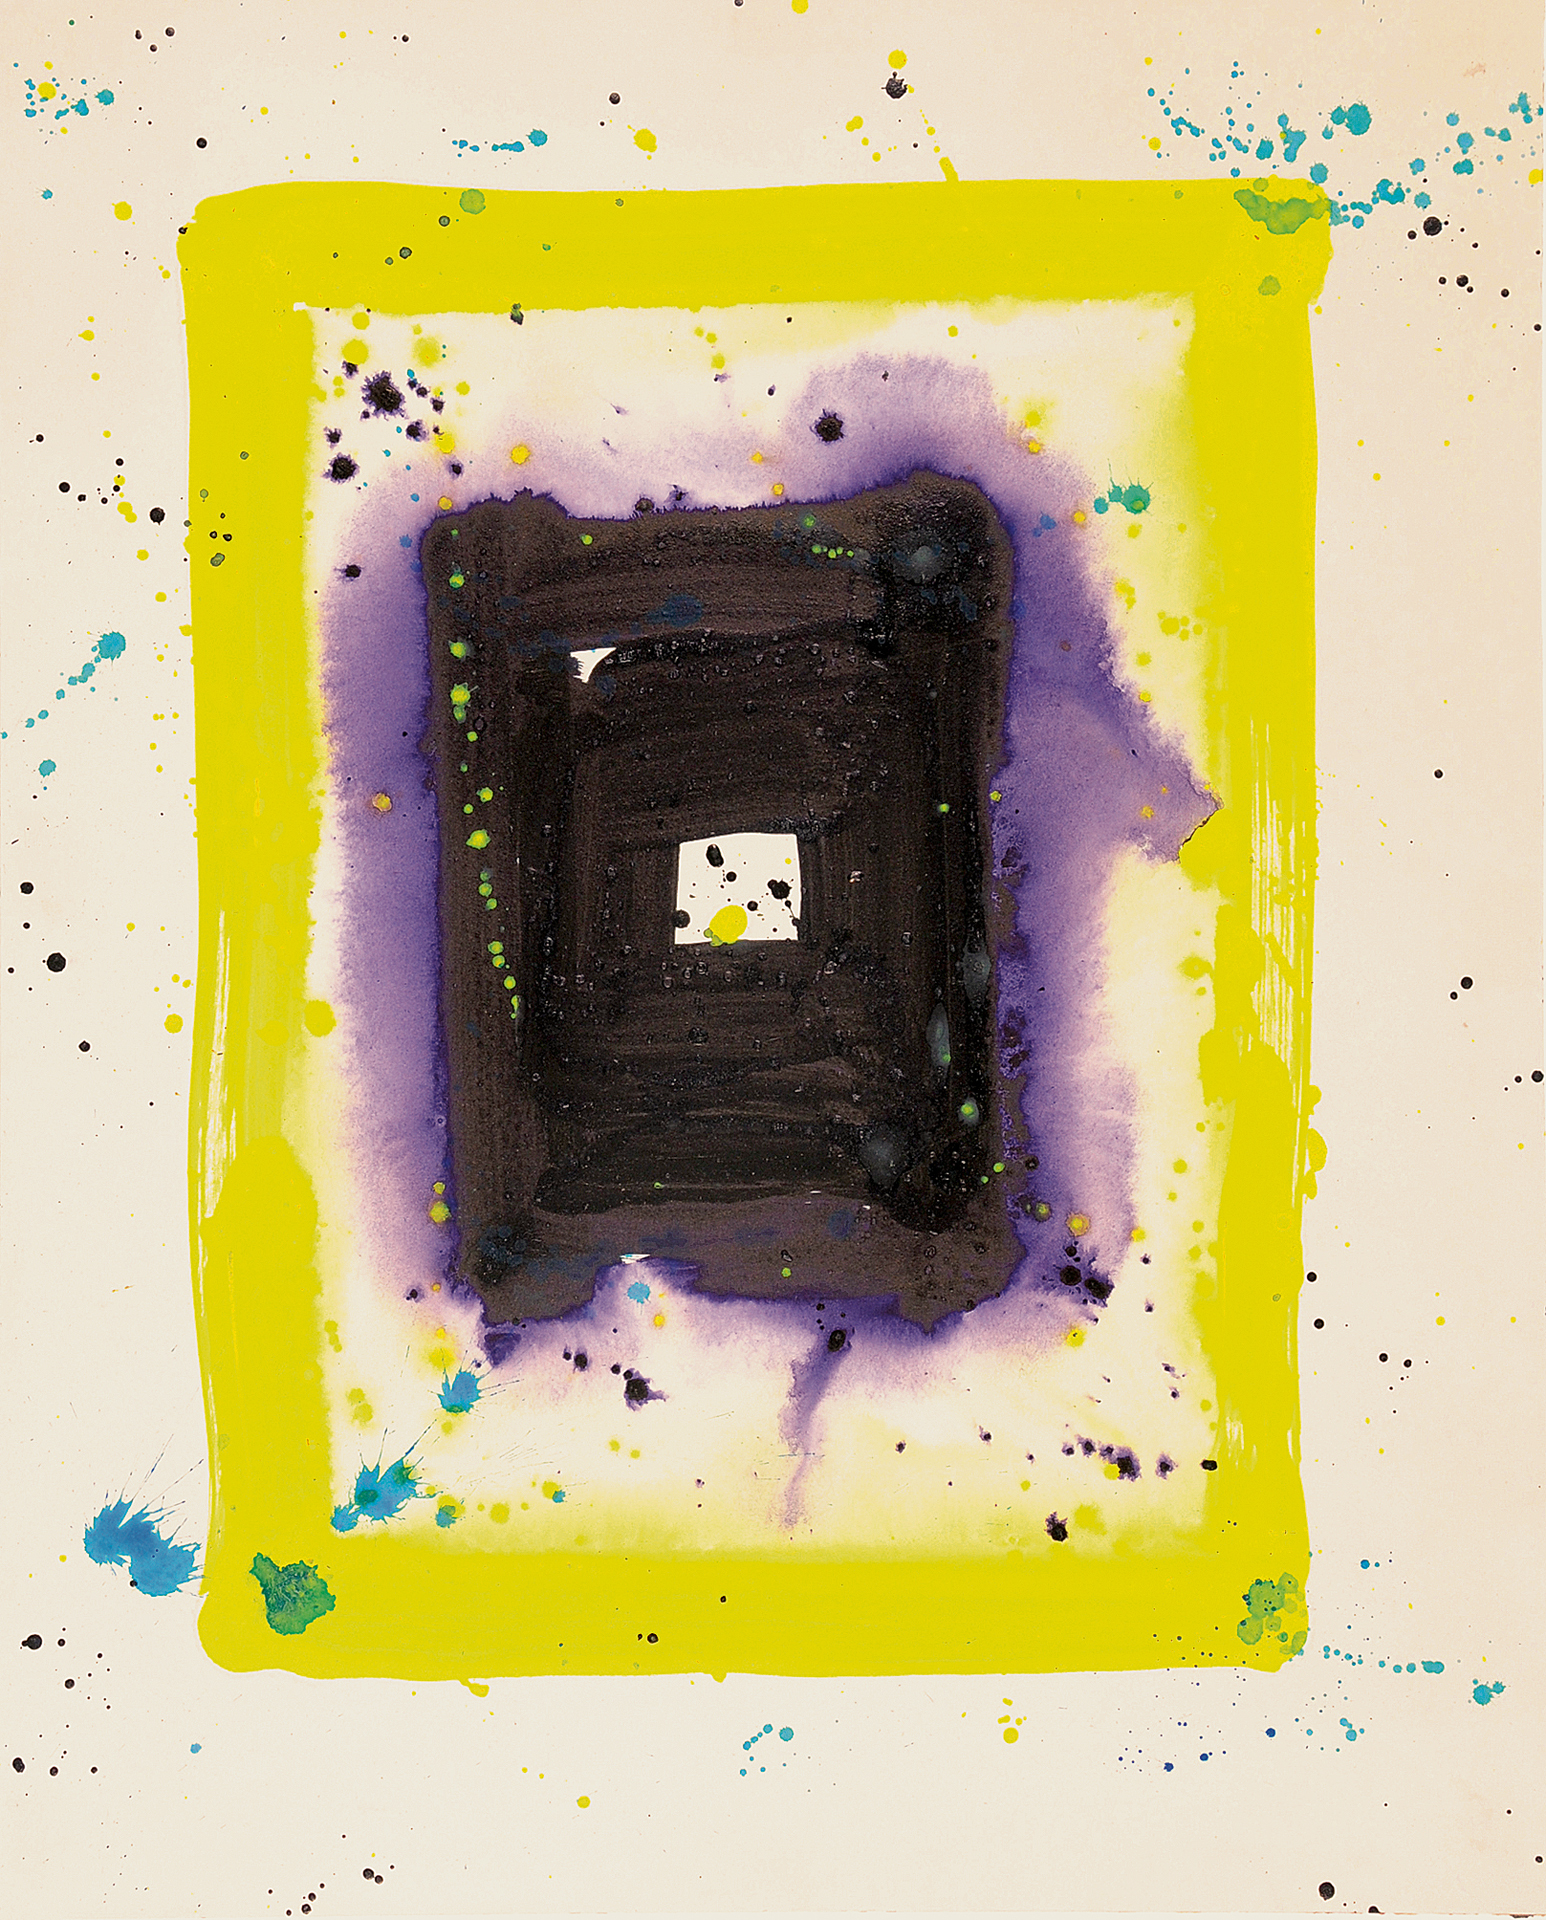 Sam Francis, Untitled (Mandala), SF 75-029